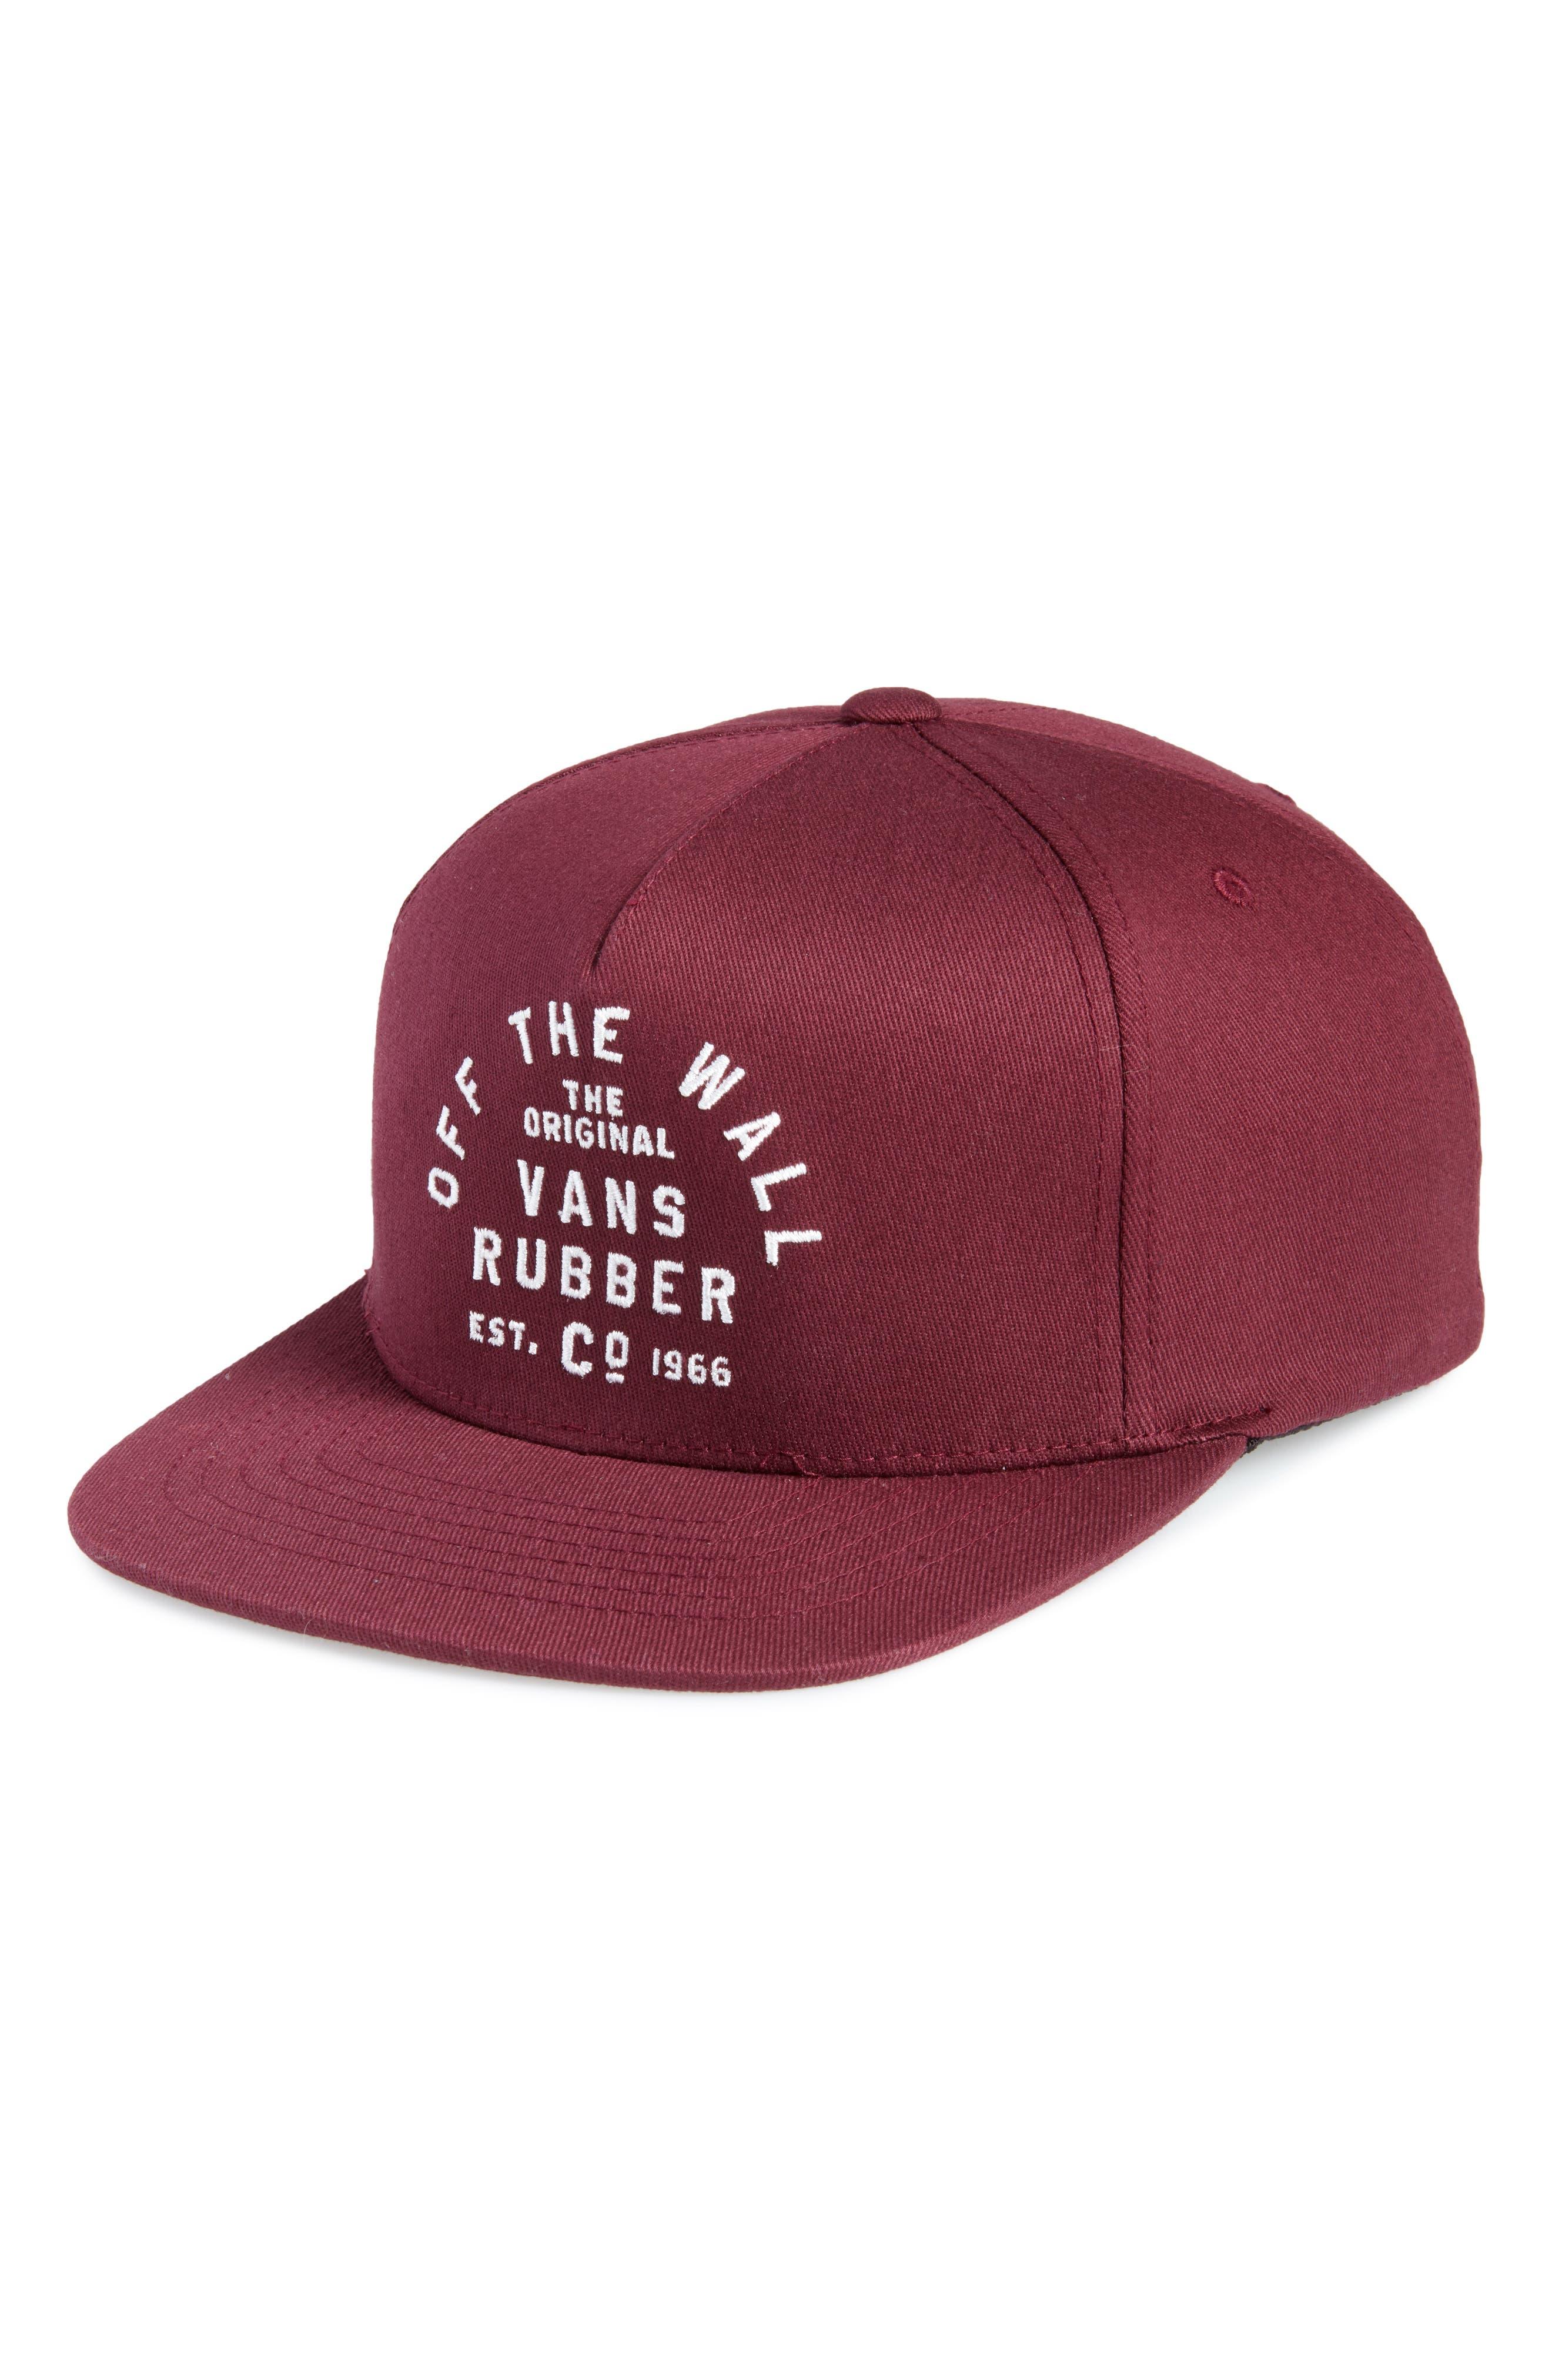 Vans Rubber Co Flexfit Cap (Big Boys)